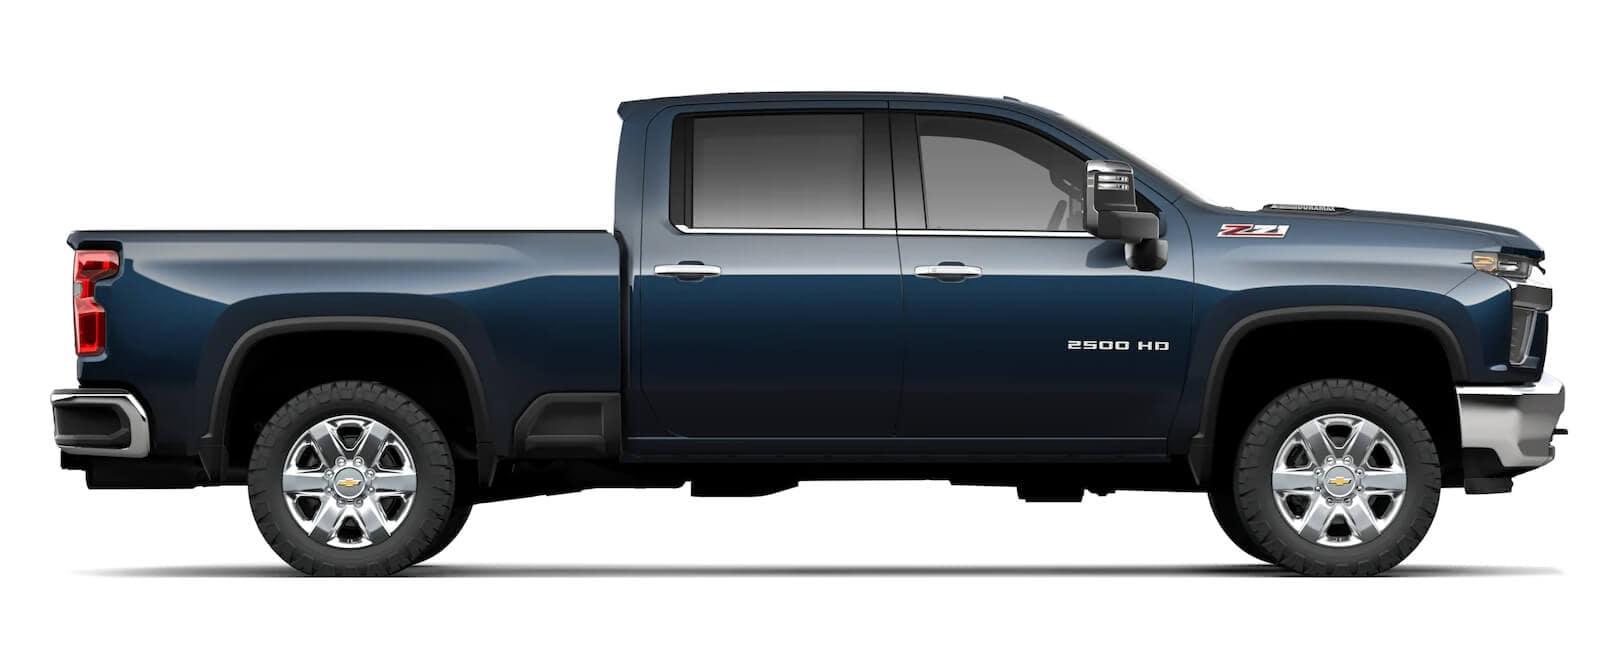 New Chevrolet Vehicles: 2021 Silverado HD